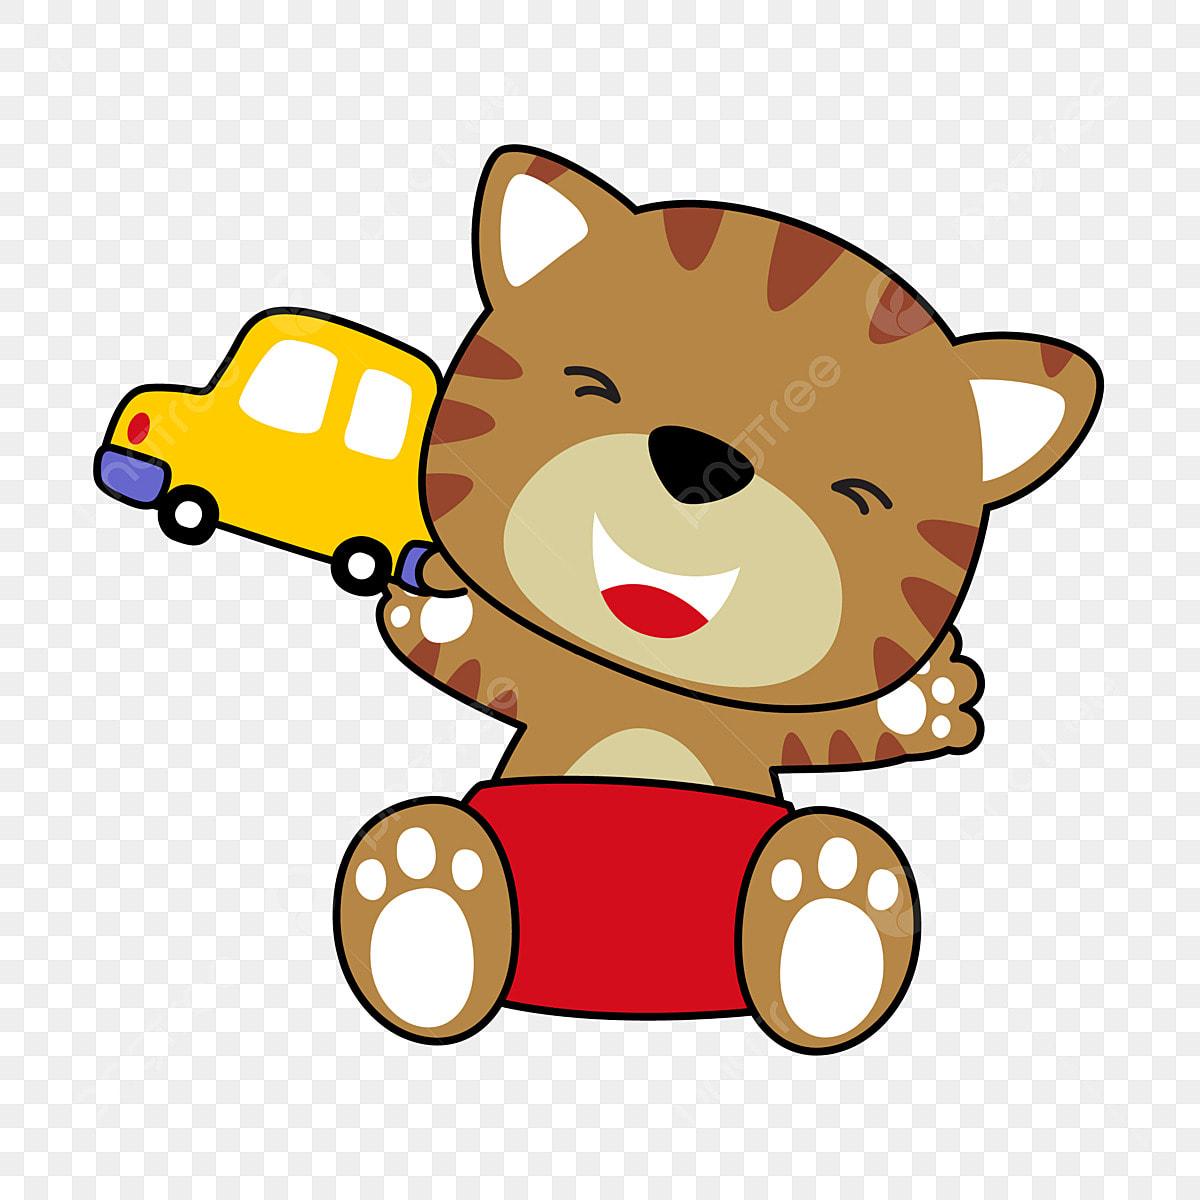 Gambar Kereta Versi Kartun Kucing Kitty Kucing Versi Q Q Versi Anak Kucing Kucing Versi Q Bahan Kereta Kartun Png Dan Vektor Untuk Muat